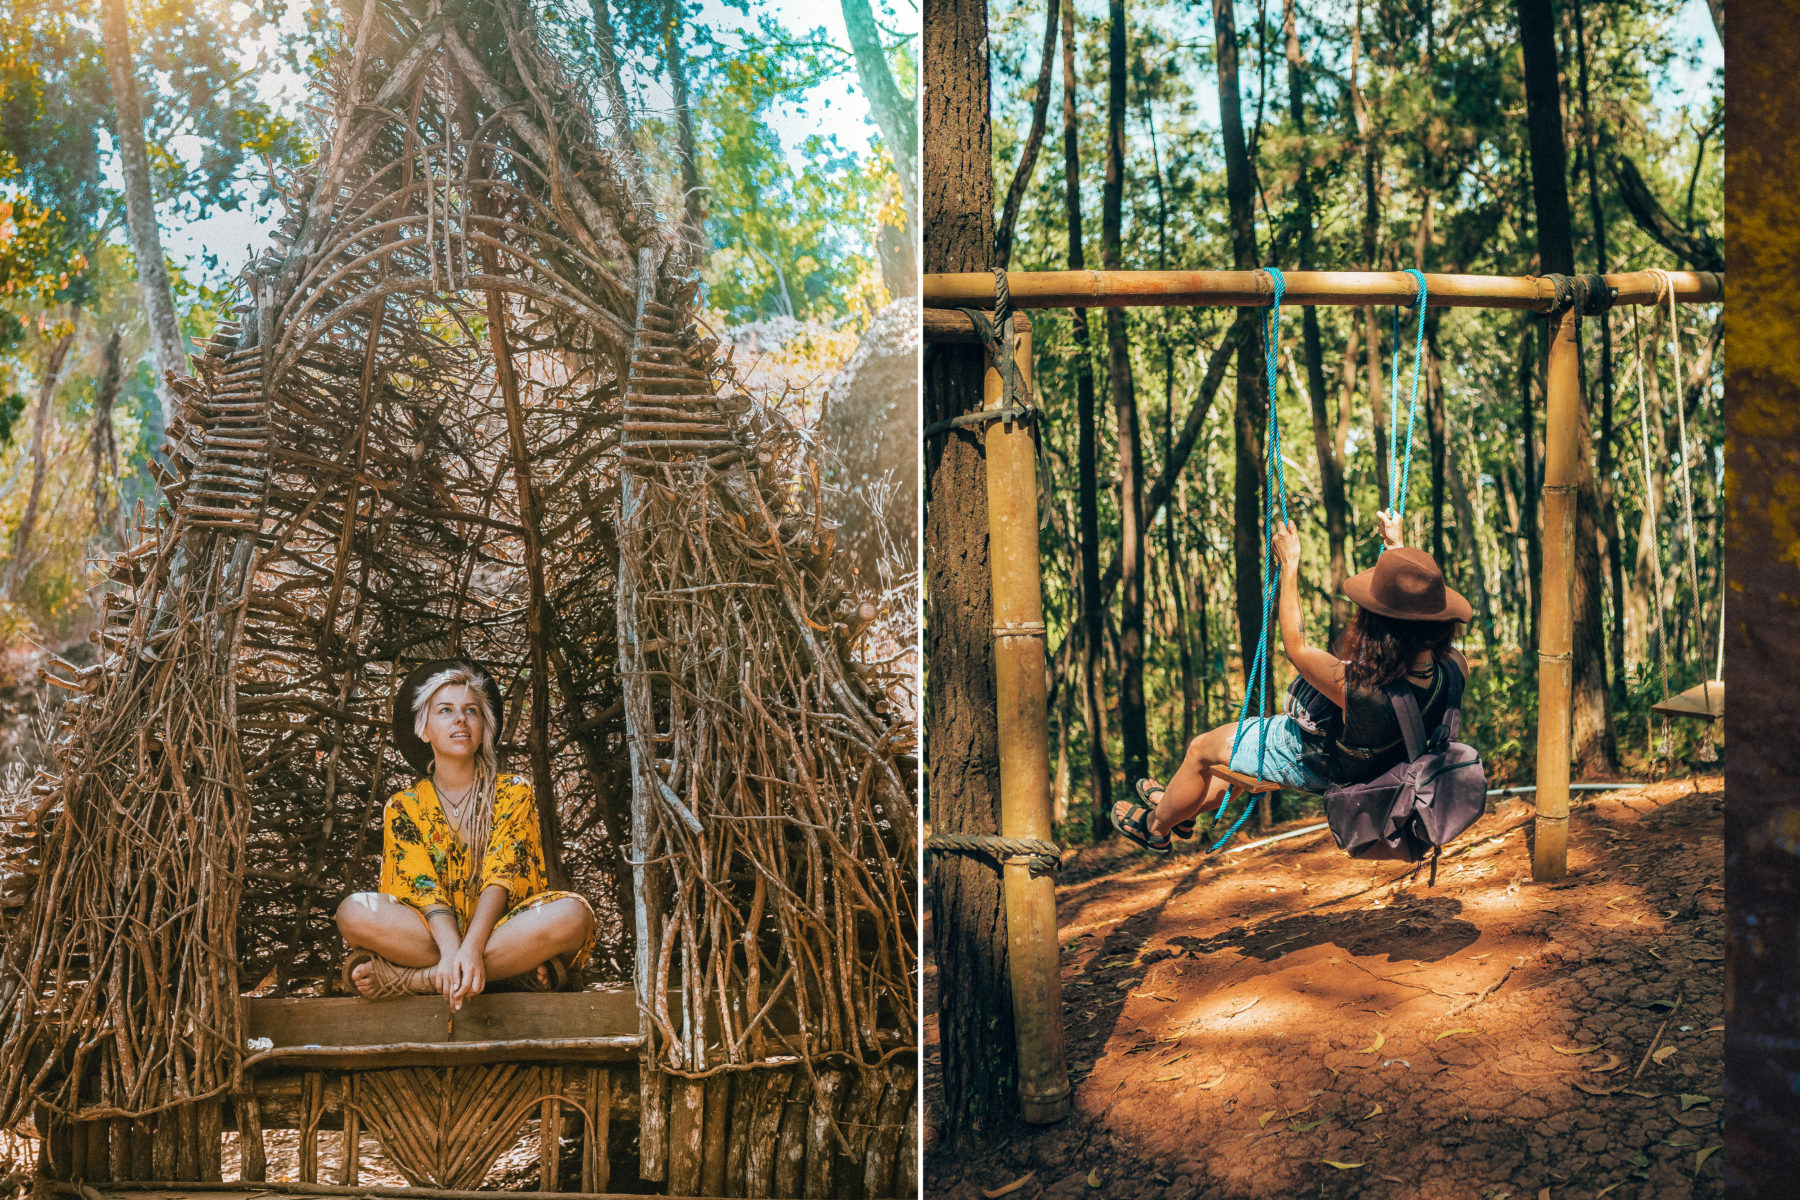 indonesia java yogyakarta jogja south java hobbit house pine trees green exploring